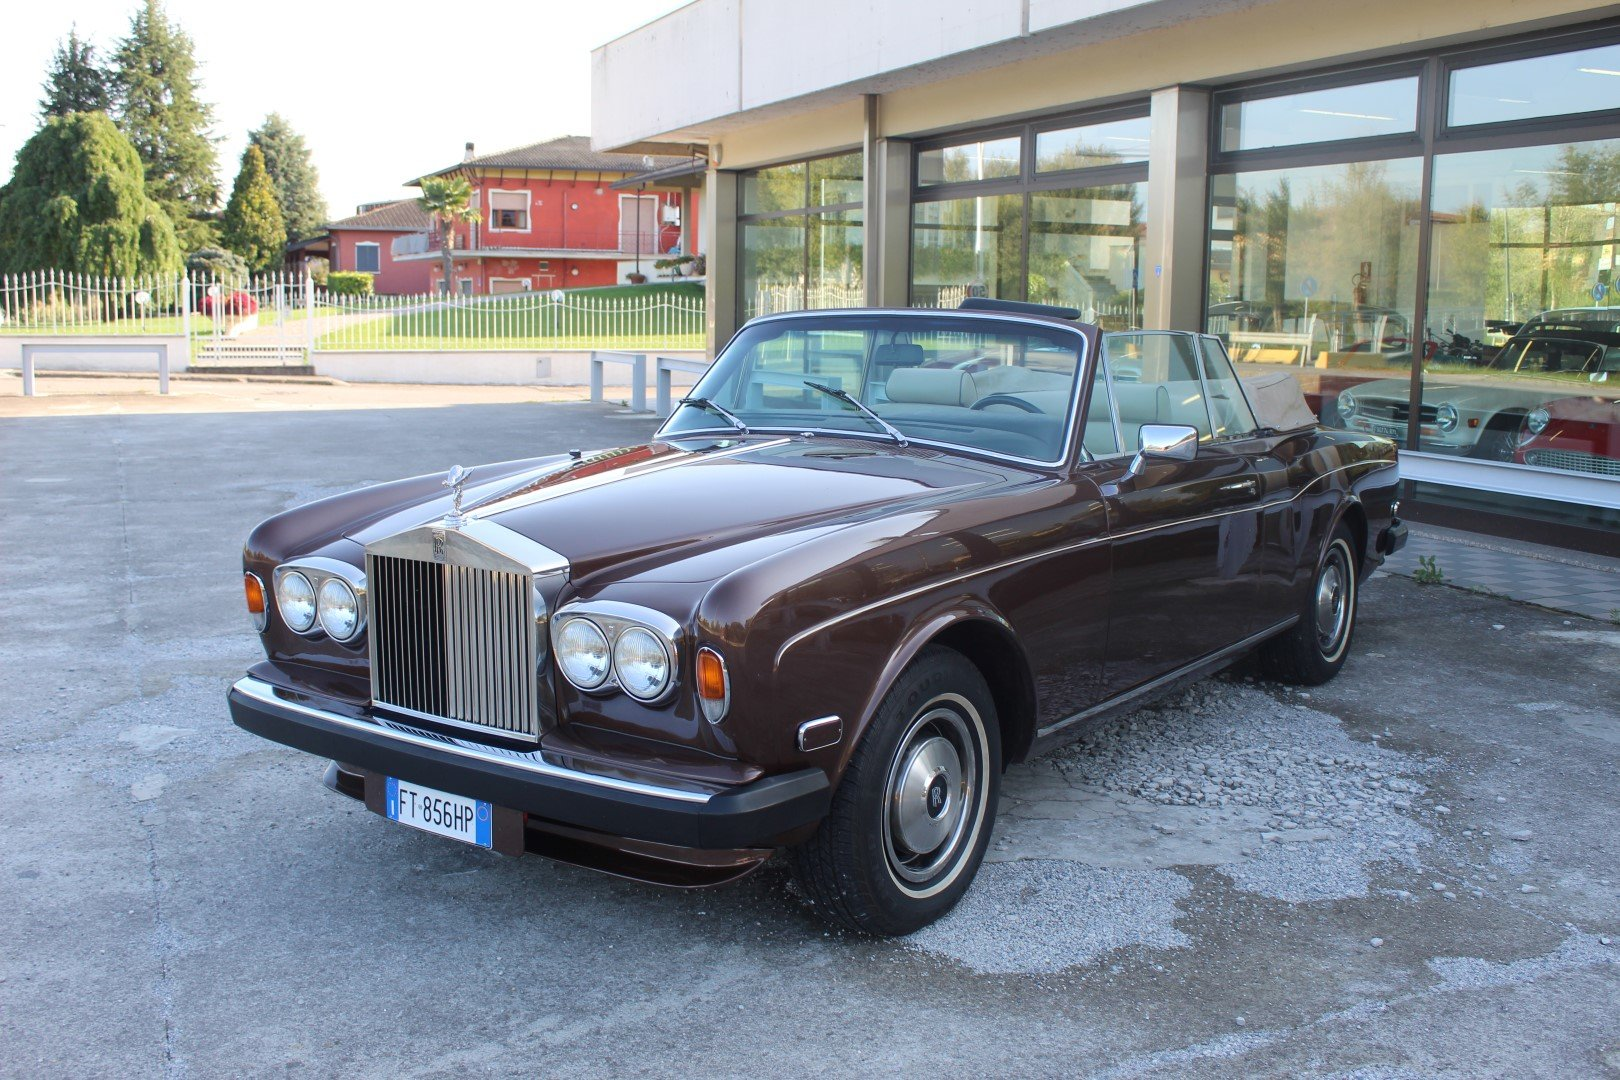 1977 Rolls royce corniche ii convertible lhd european For Sale (picture 2 of 6)